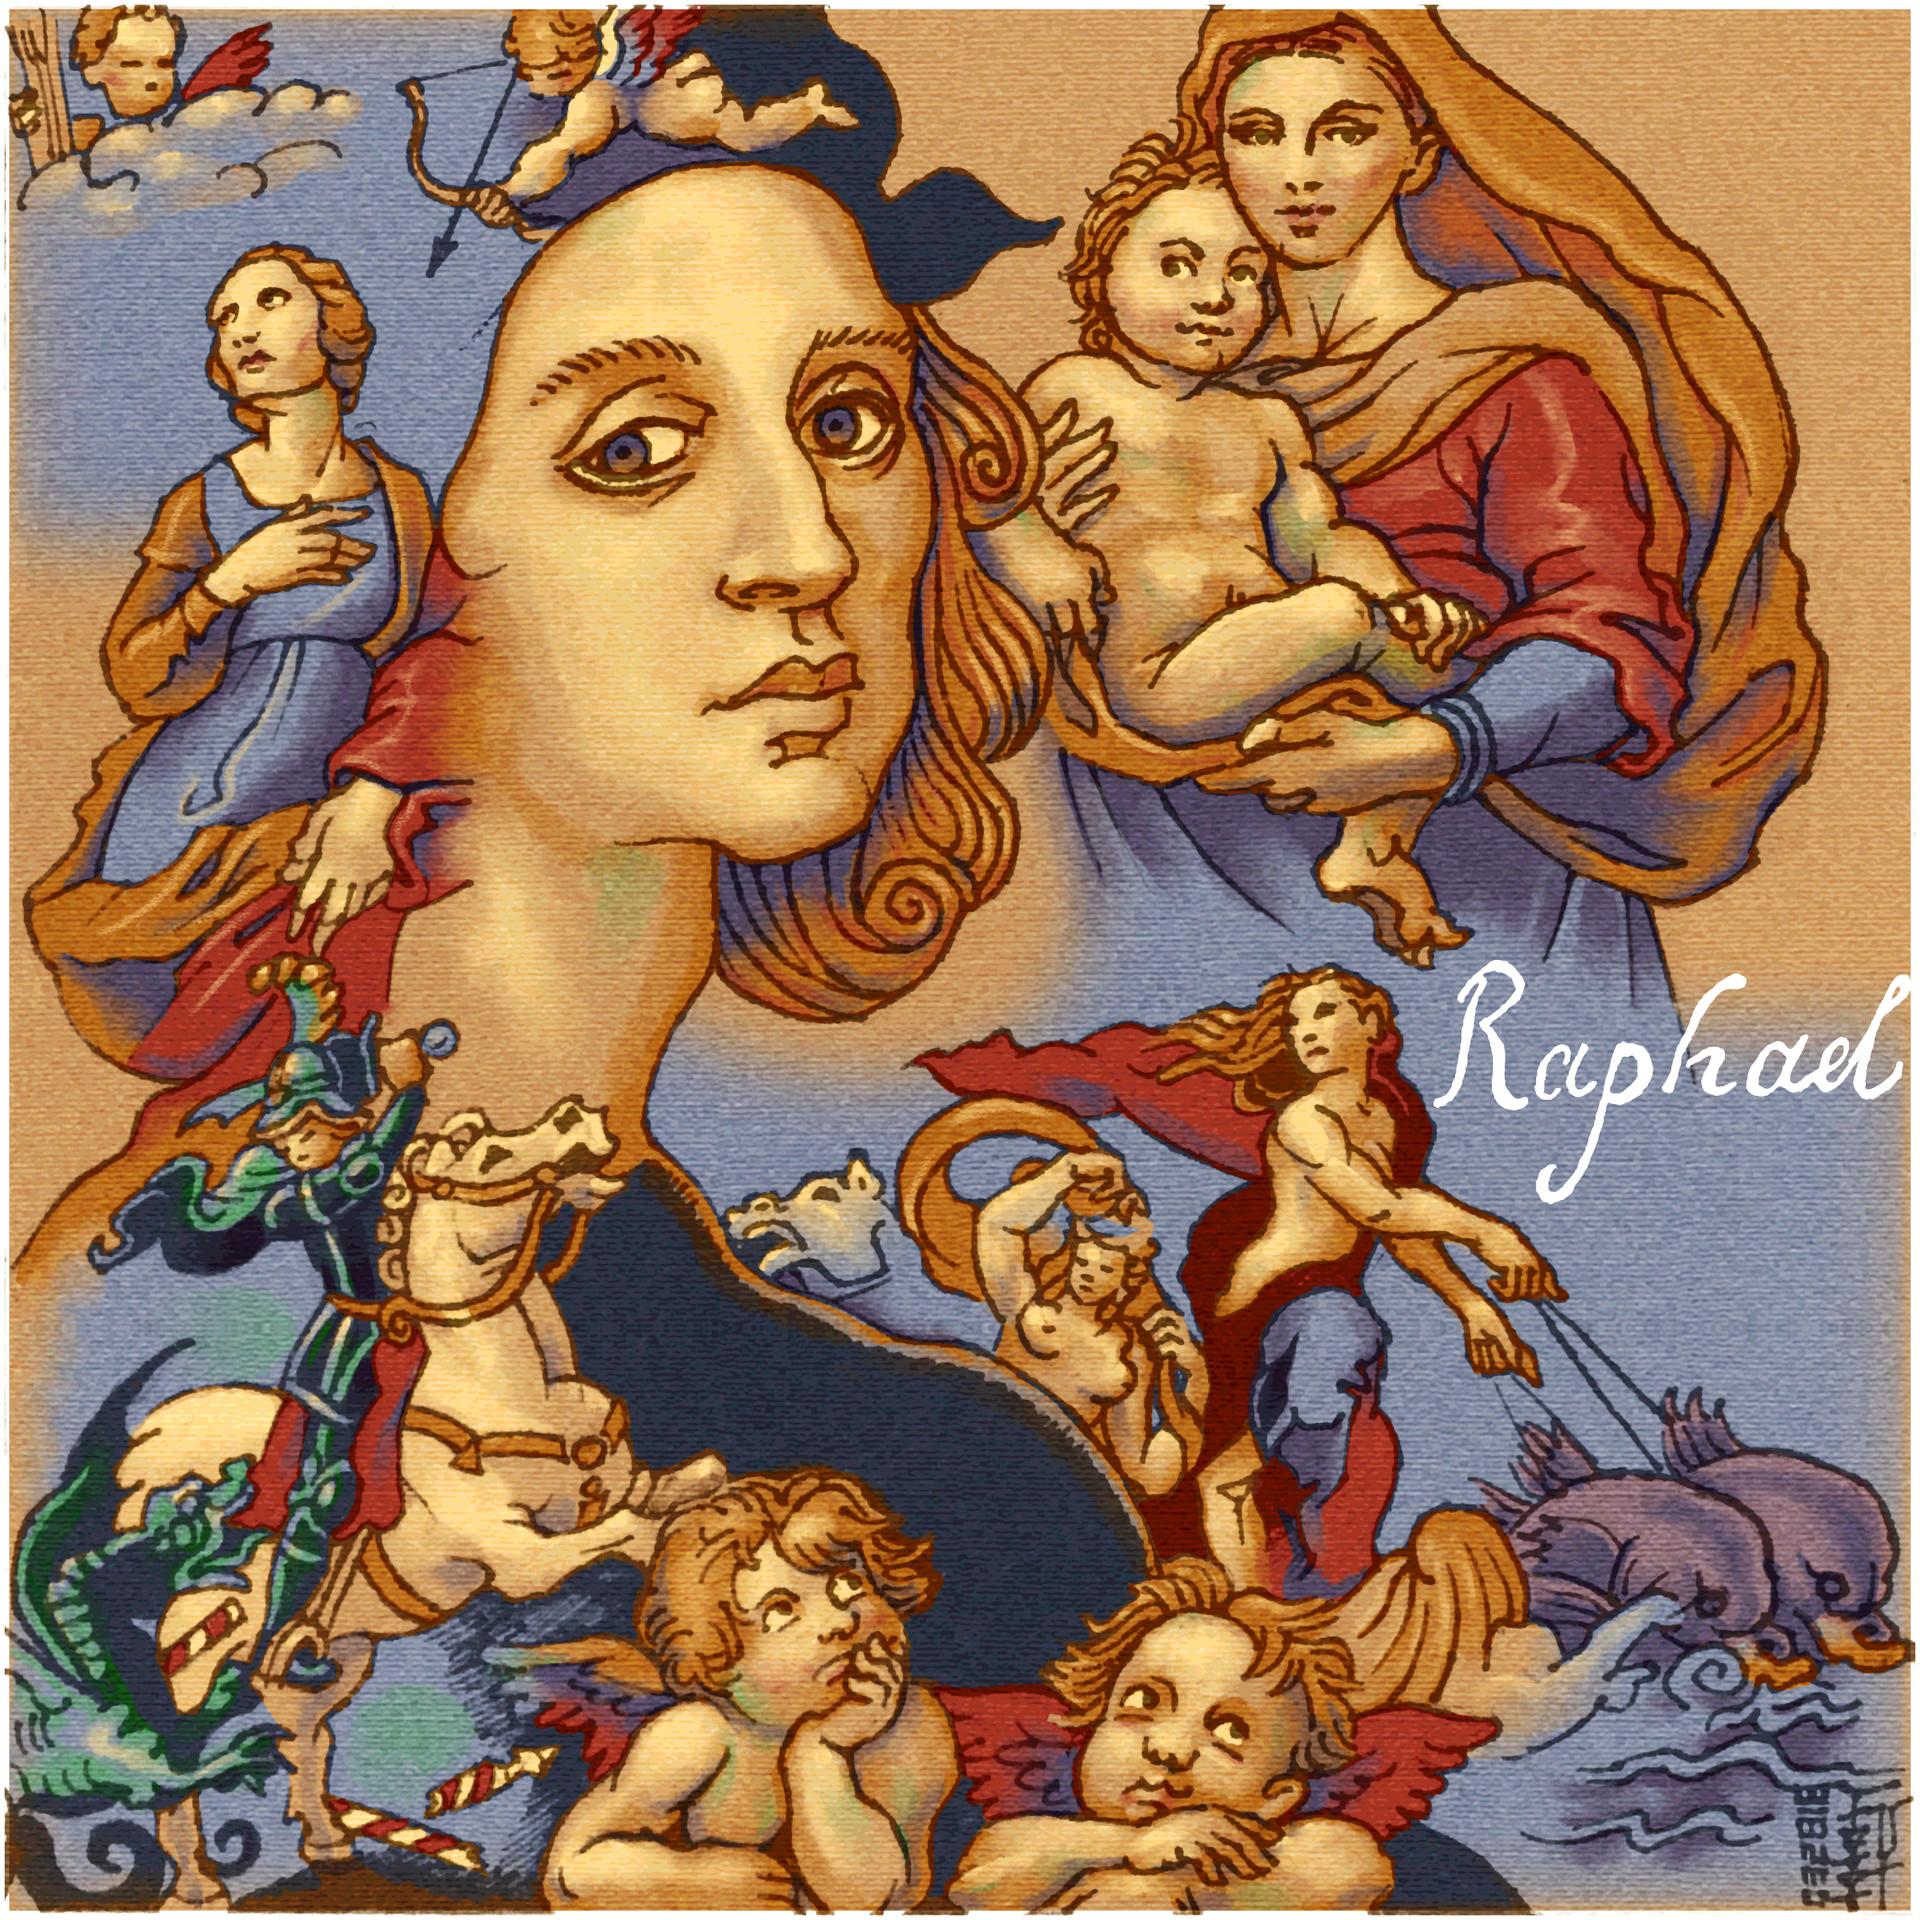 Day 03-28-18 - Raphael